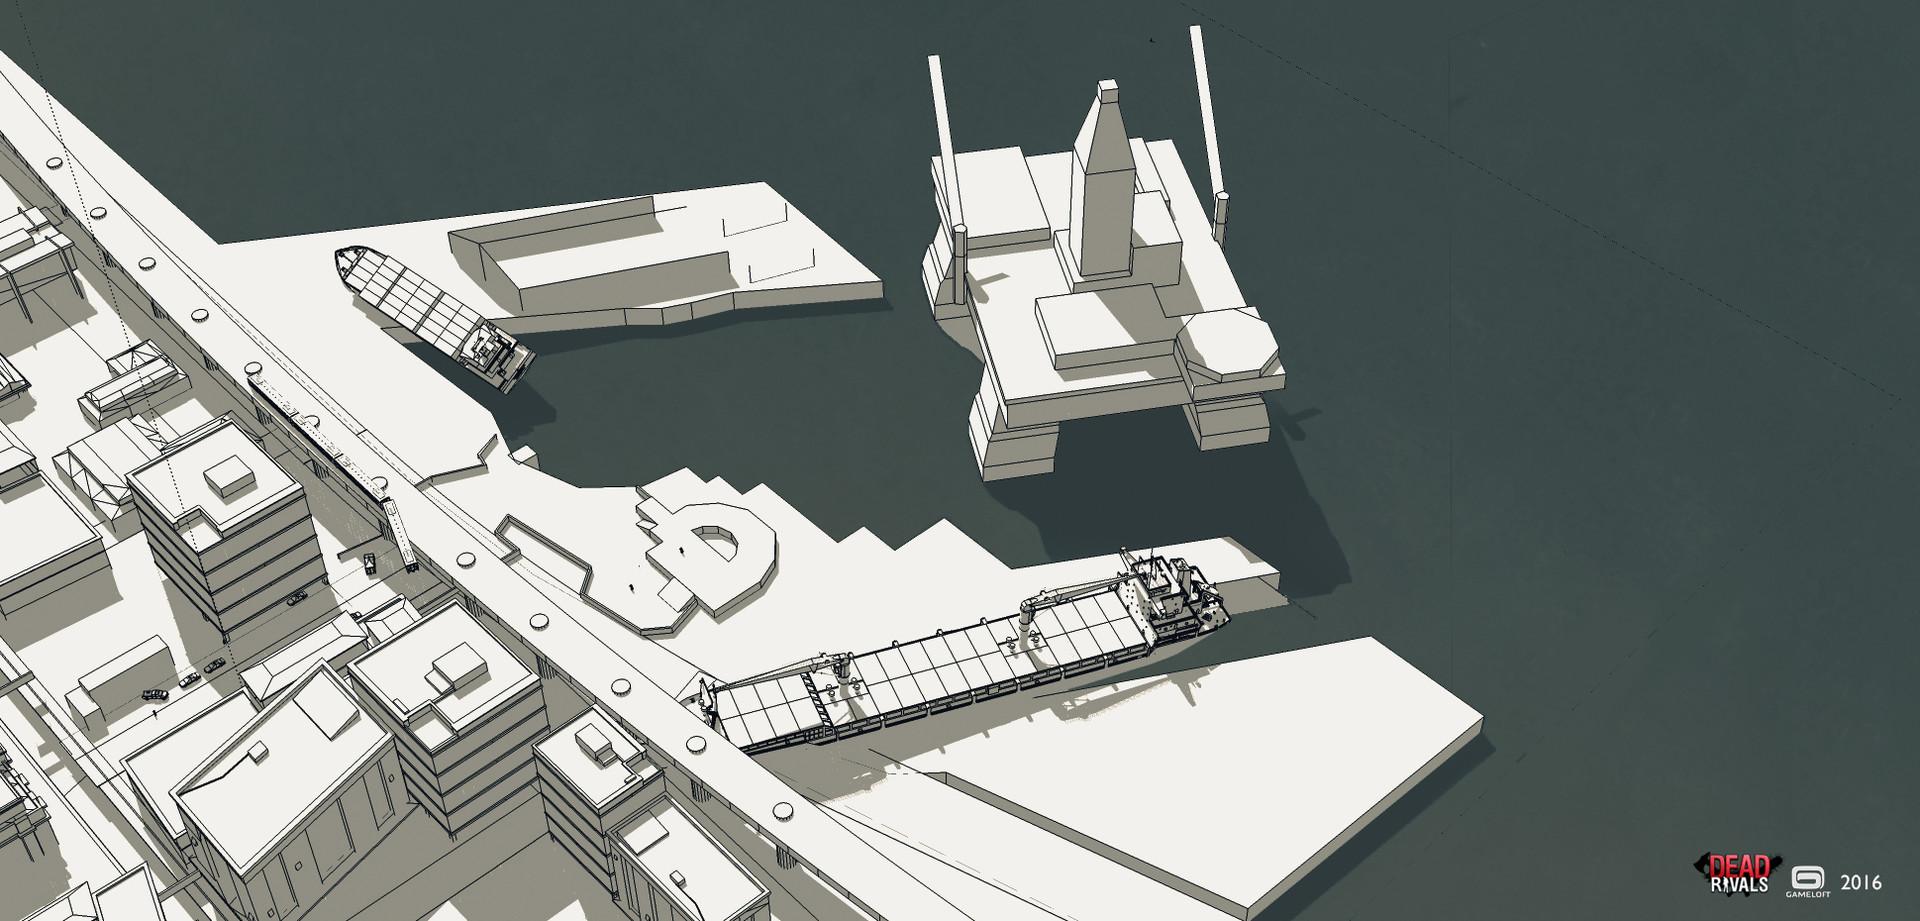 Adrien girod dw shipyard topview01 artstation